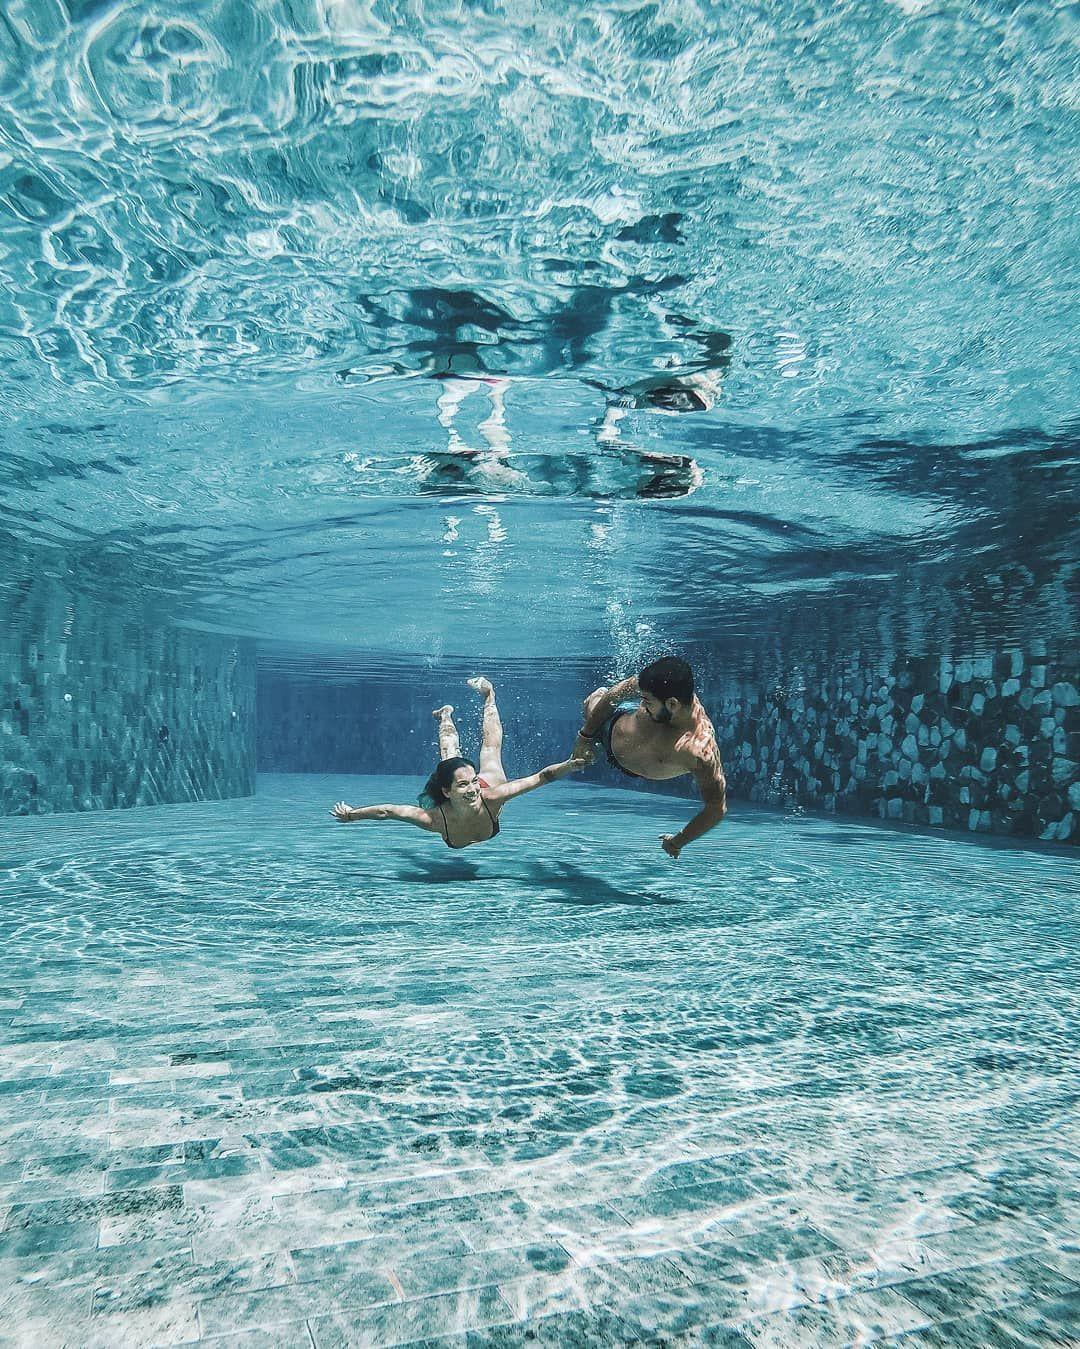 Gopro Underwater Couple Travel Asia Pool Beautiful Blue Underwater Pictures Underwater Photography Underwater Photography Couples